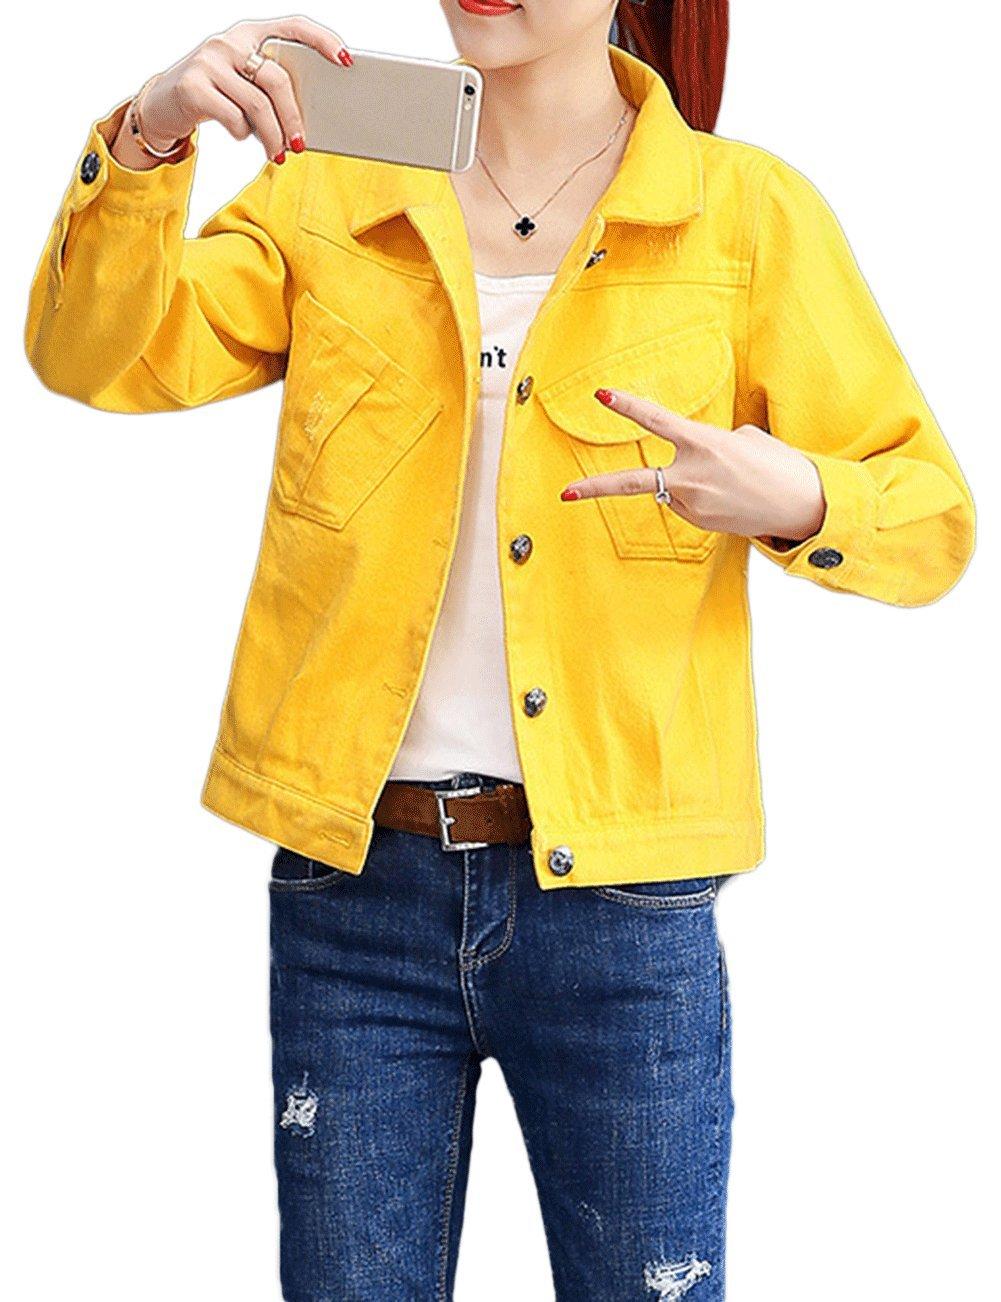 ZLSLZ Womens Grils Casual Cute Ripped Denim Jean Trucker Jacket Coat Yellow US L